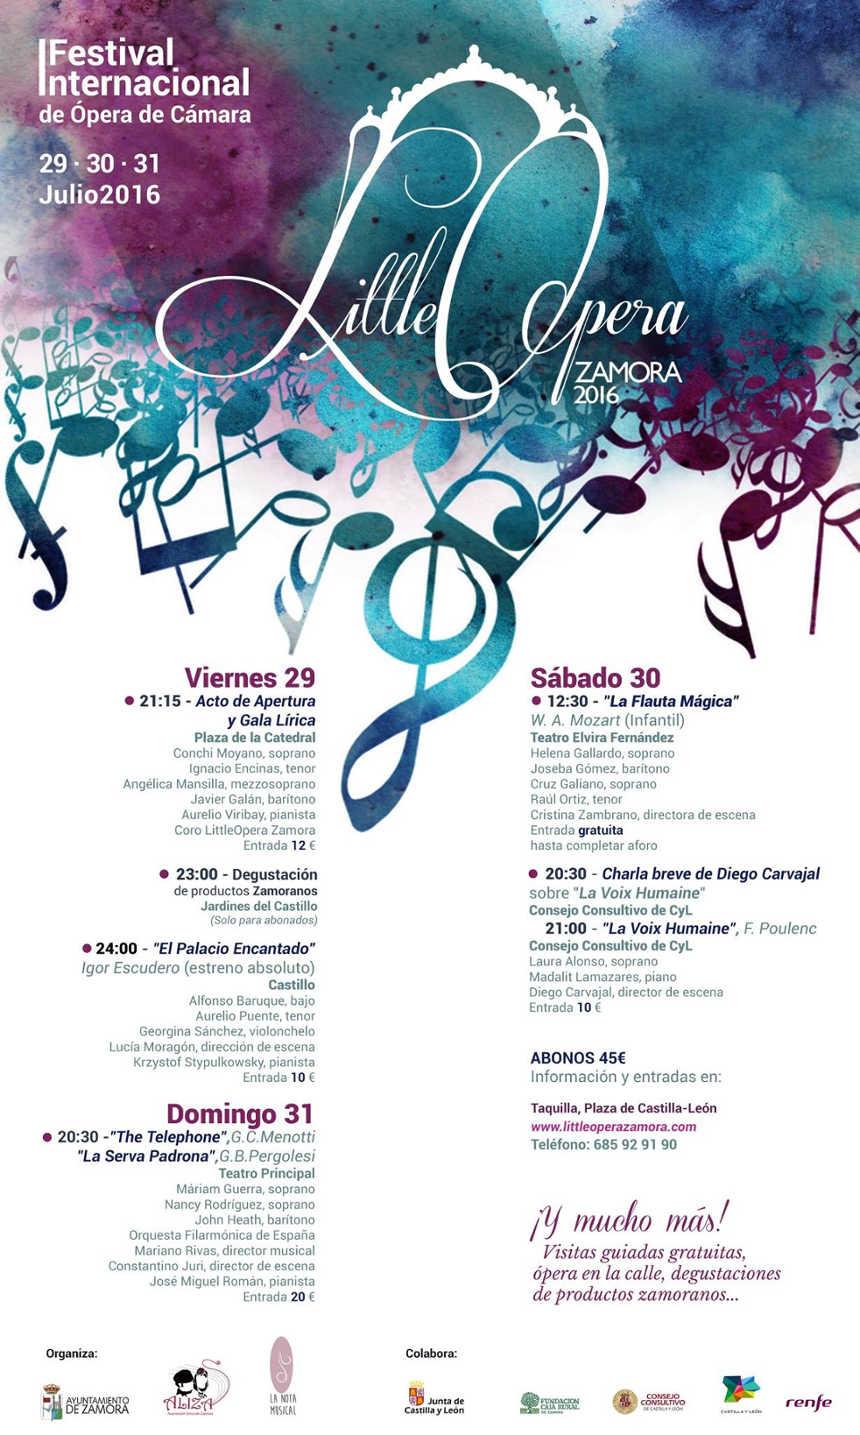 Toda la Música | II Festival Internacional de Ópera de Cámara   LittleOpera Zamora 2017